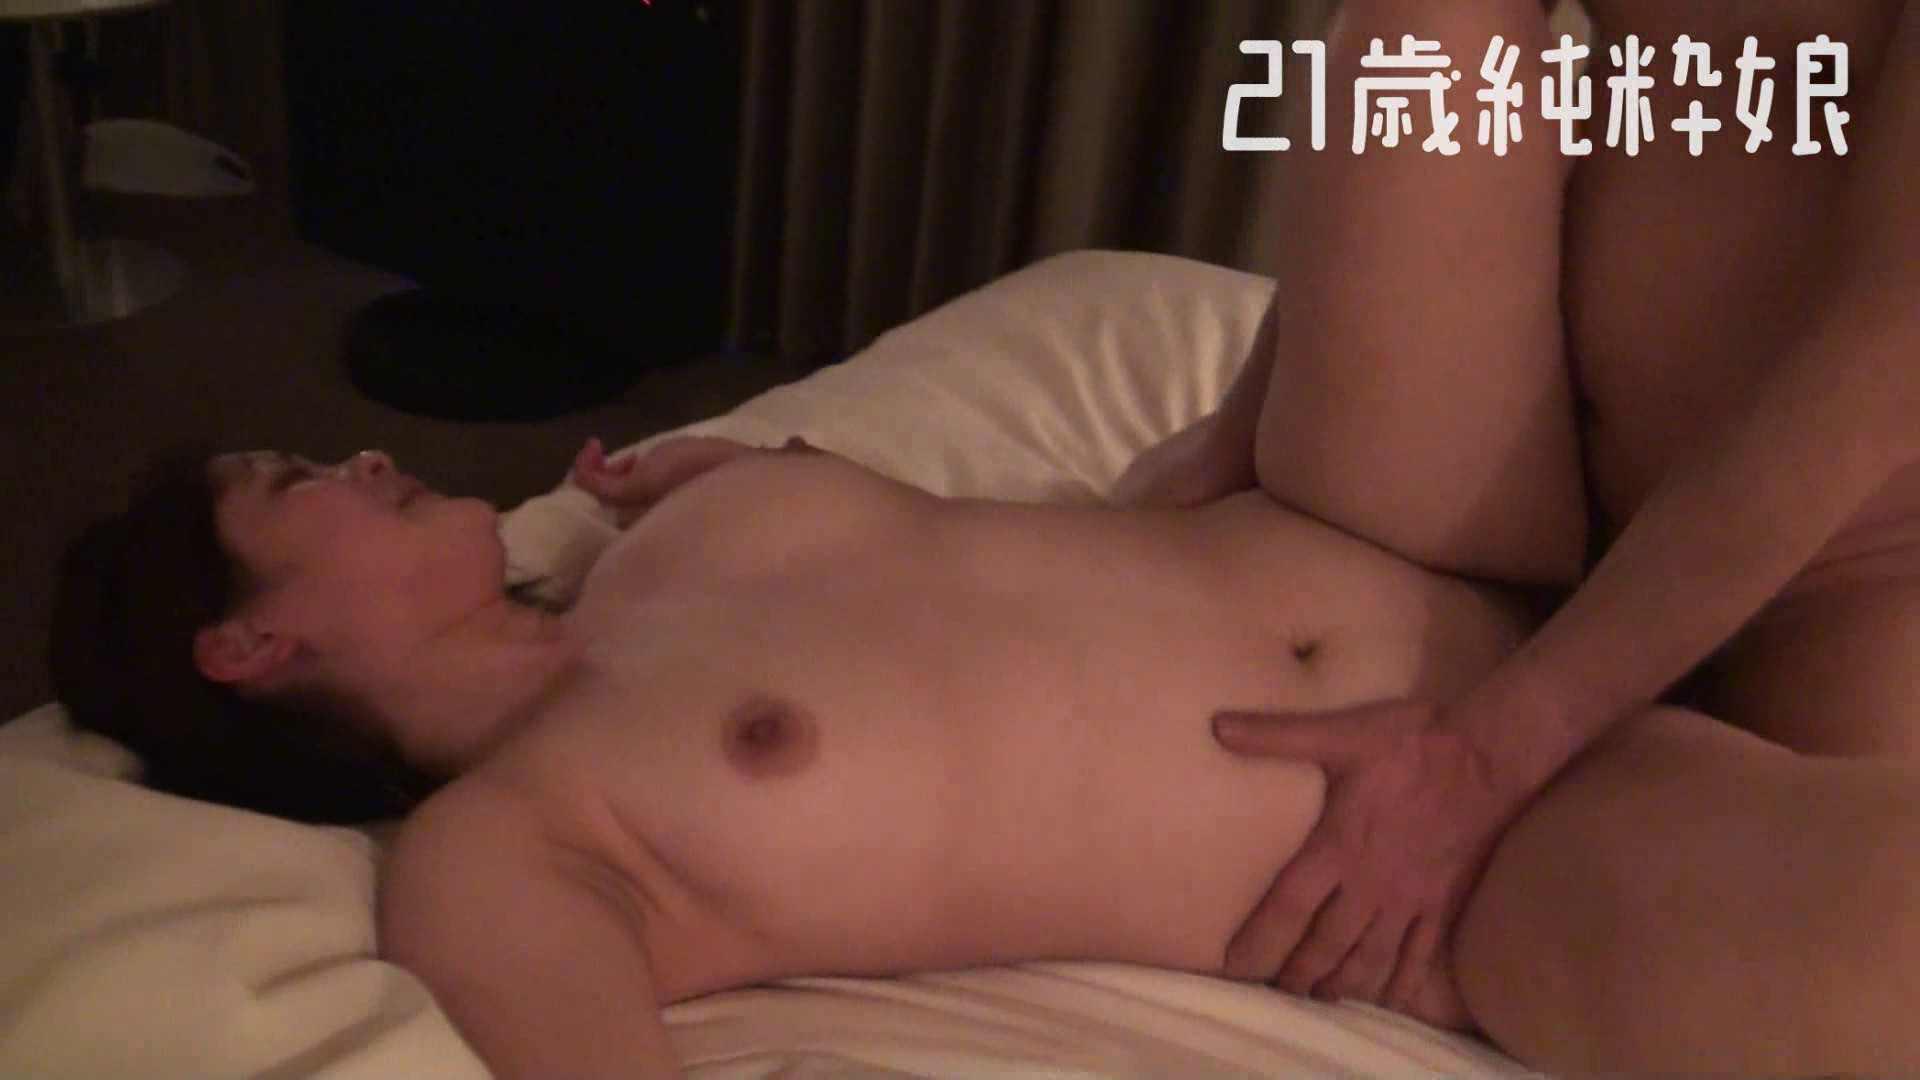 Gカップ21歳純粋嬢第2弾Vol.4 OL  82連発 70